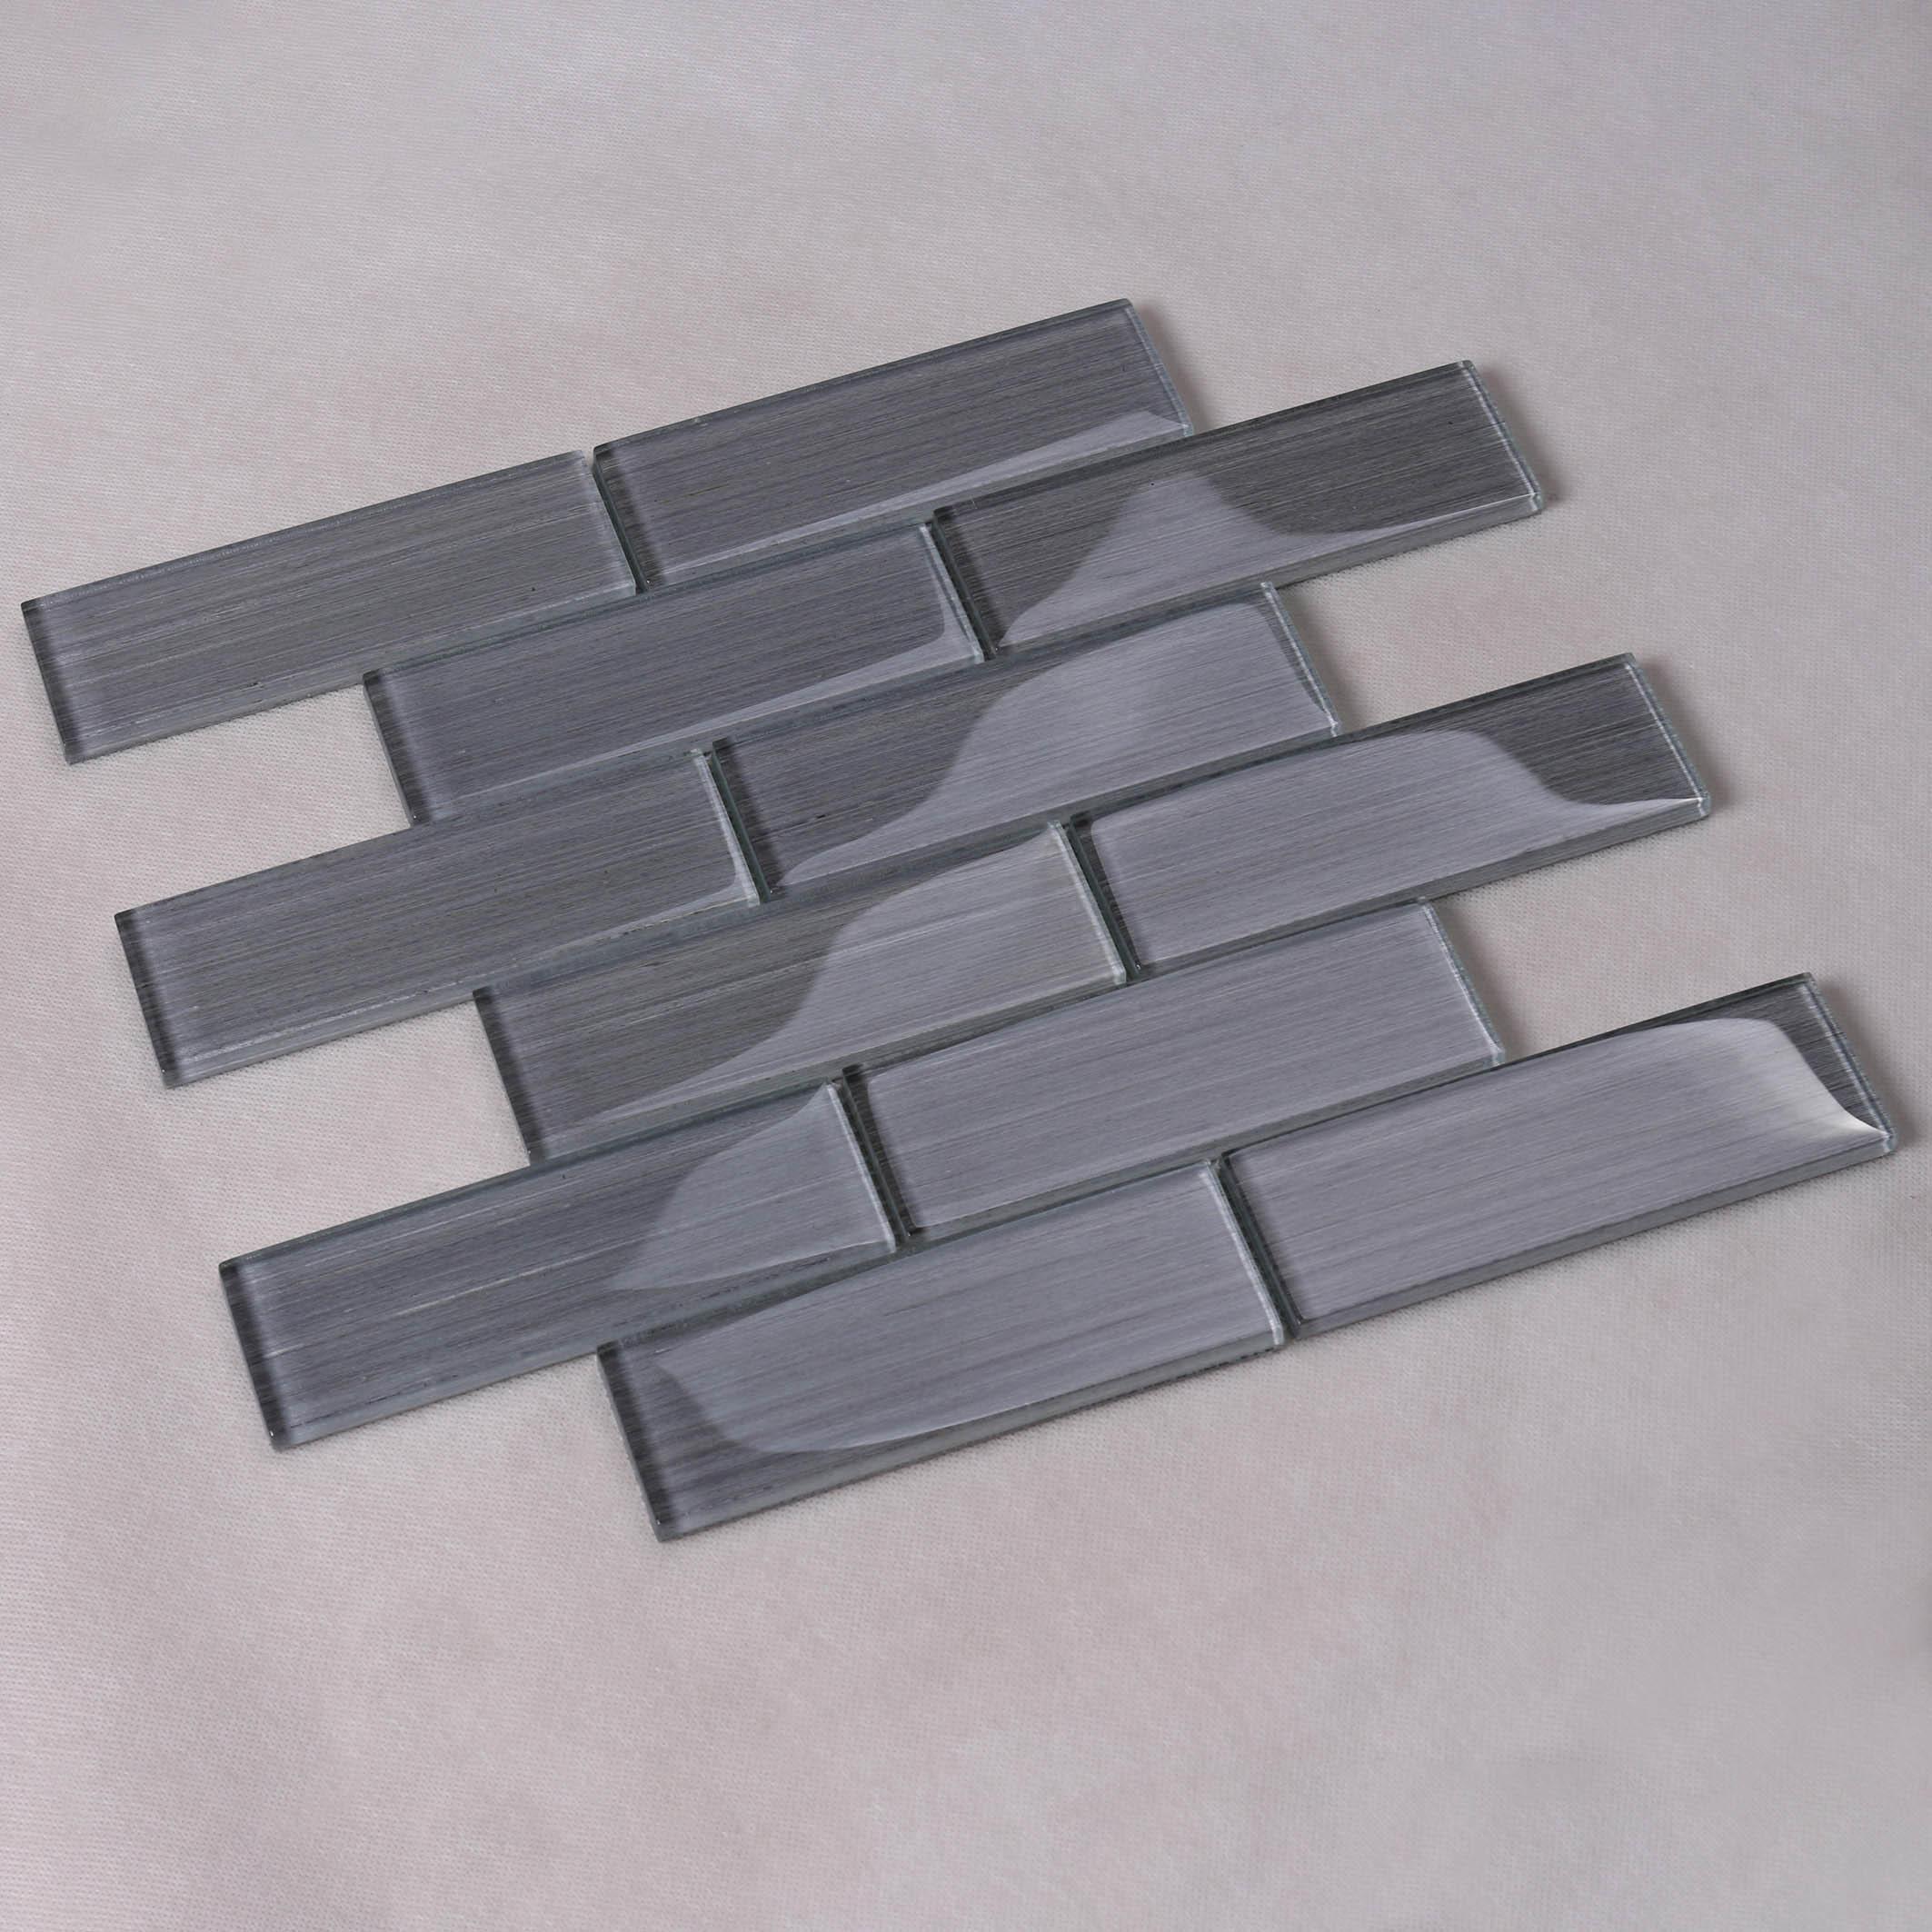 Heng Xing-Glass Wall Tiles, White Glass Backsplash Manufacturer   Glass Mosaic Tile-2